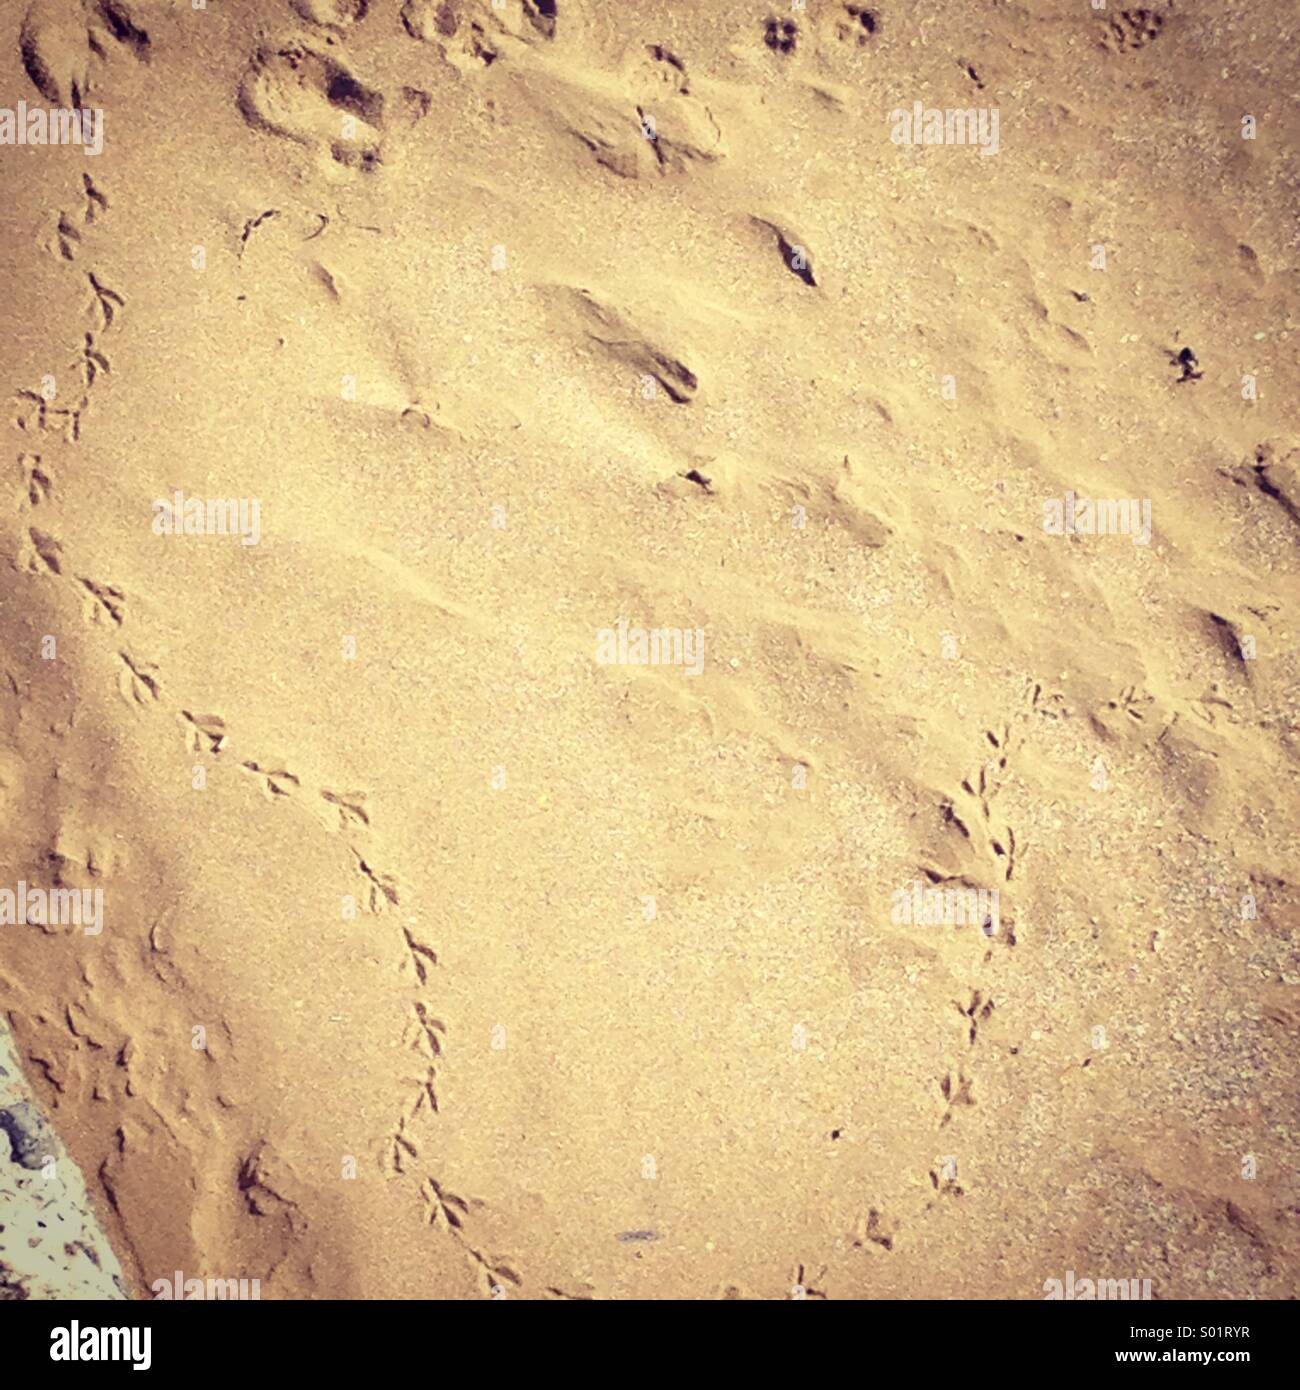 Bird footprints in the sand Stock Photo